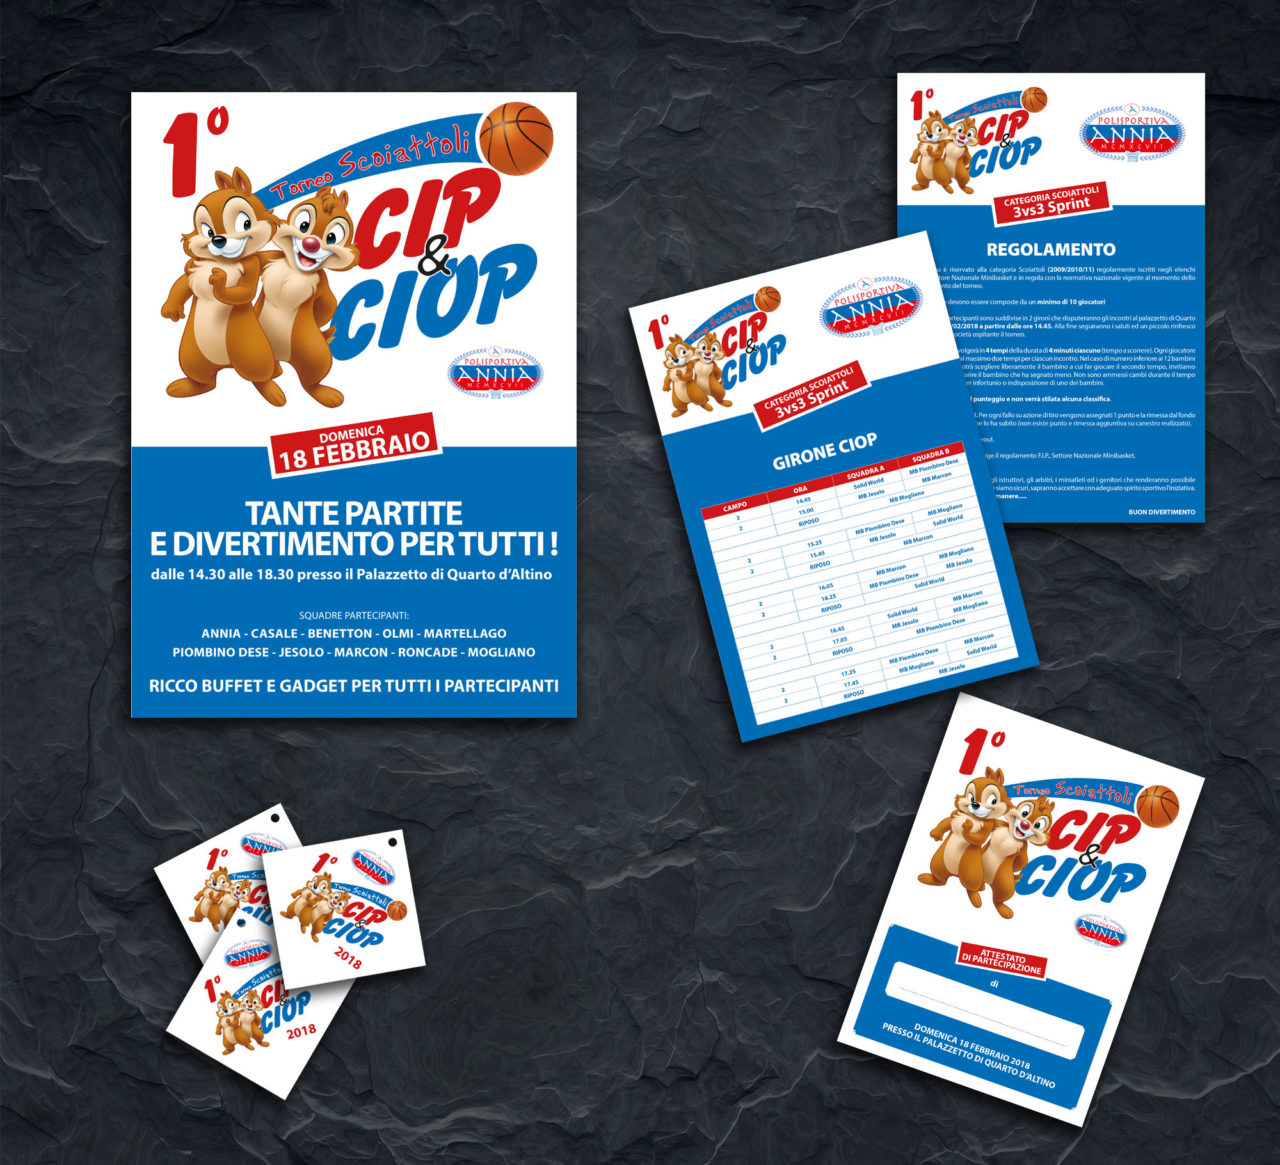 Basket Annia - Torneo Cip e Ciop